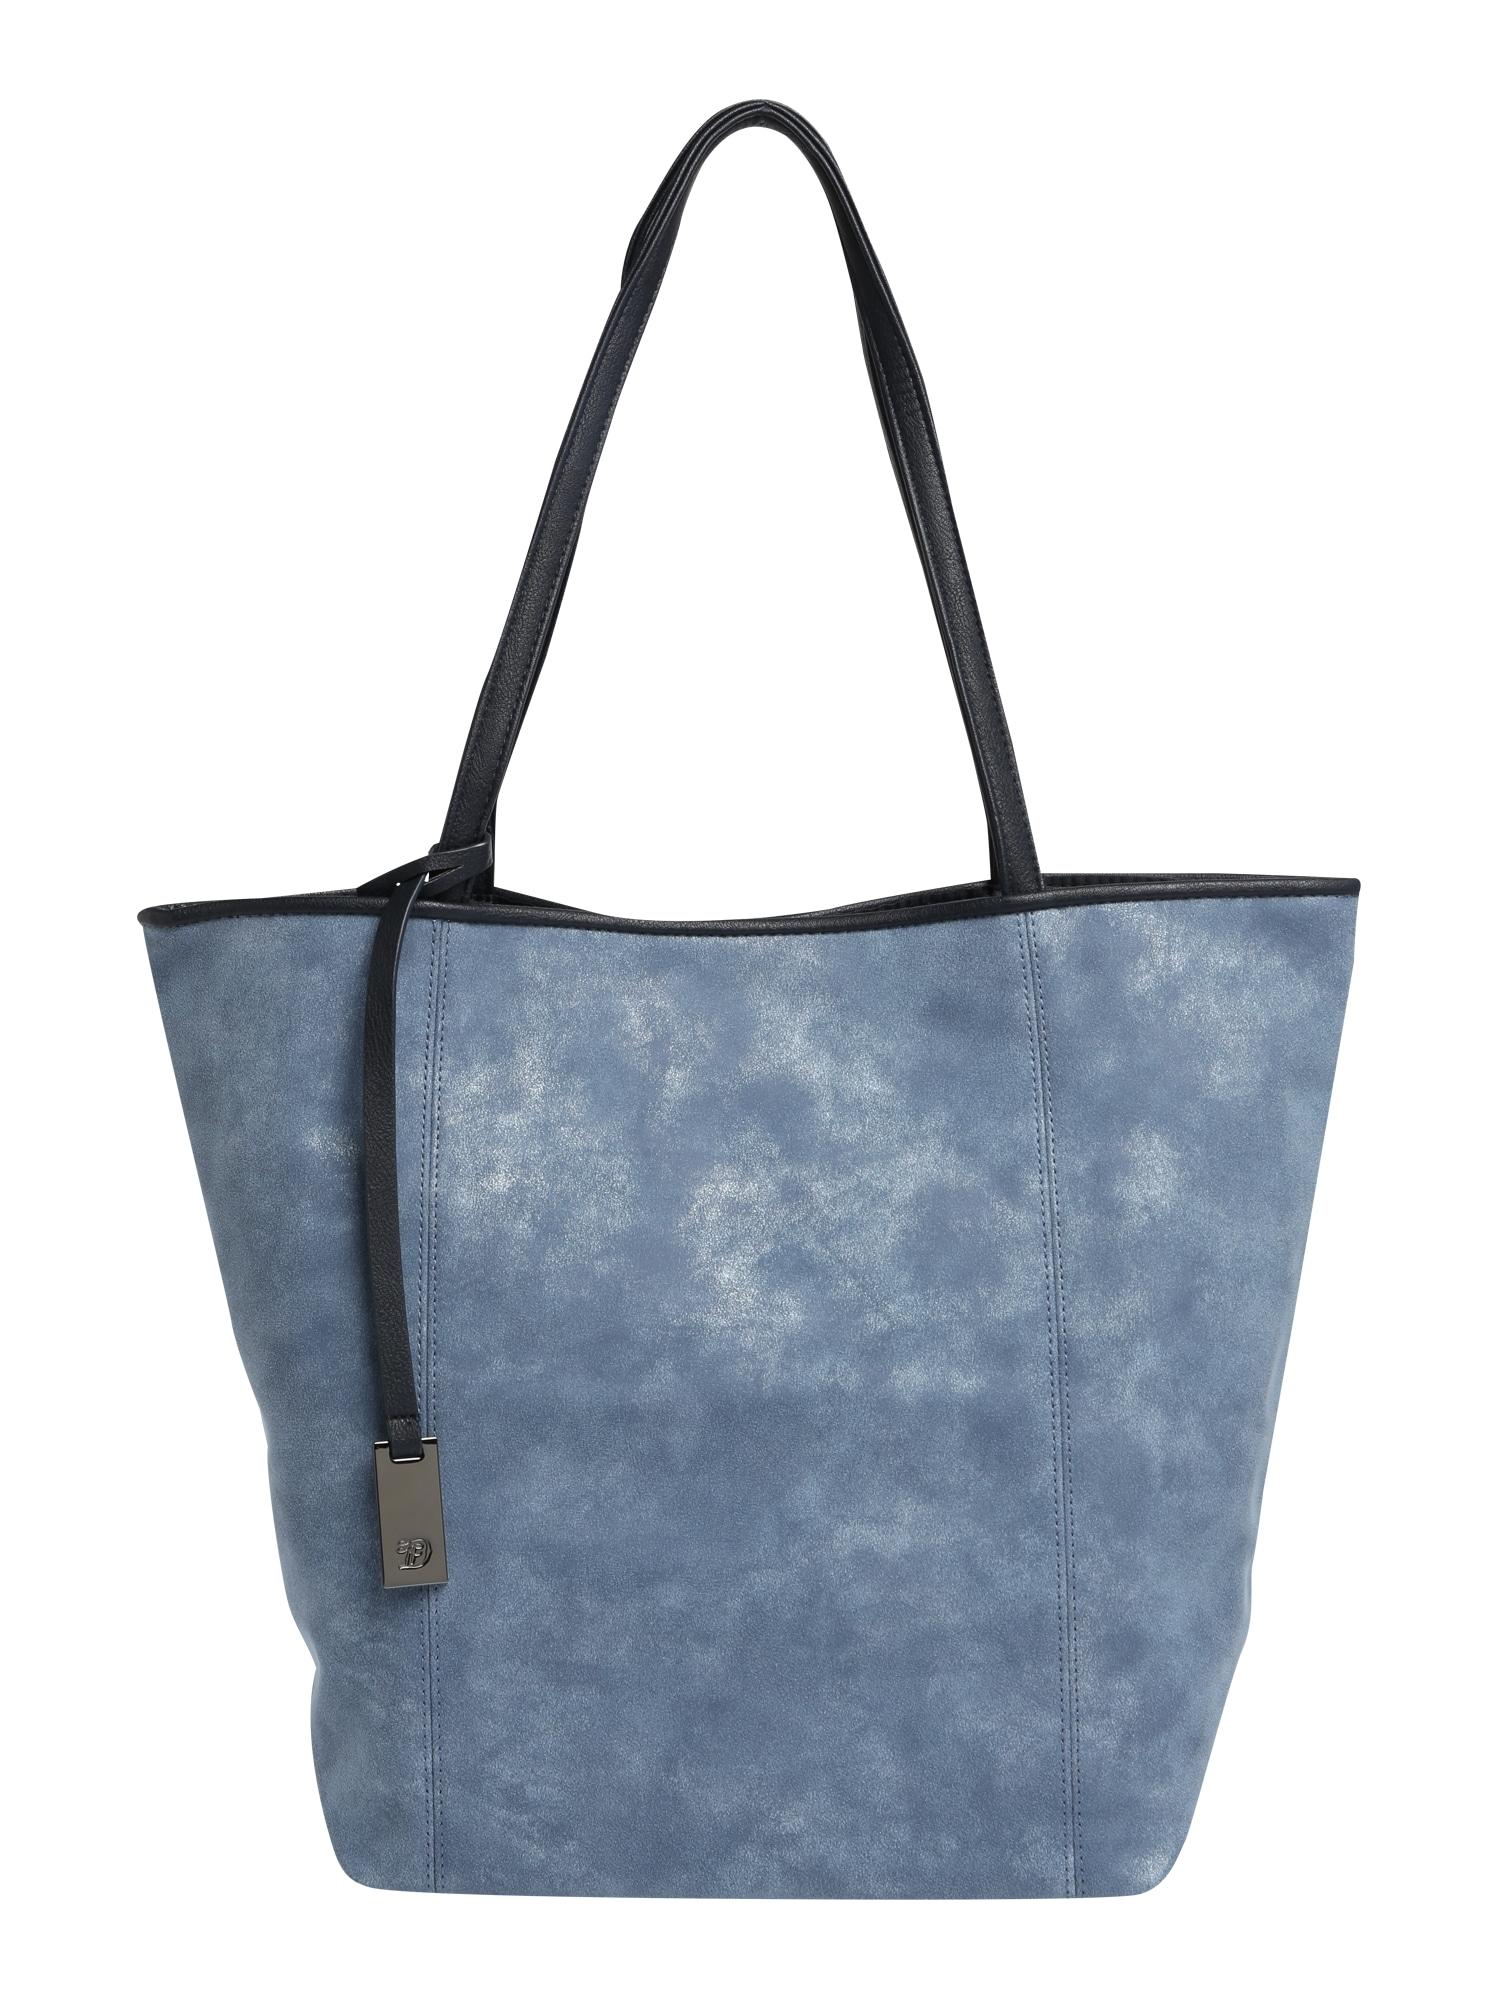 Nákupní taška MILA modrá TOM TAILOR DENIM